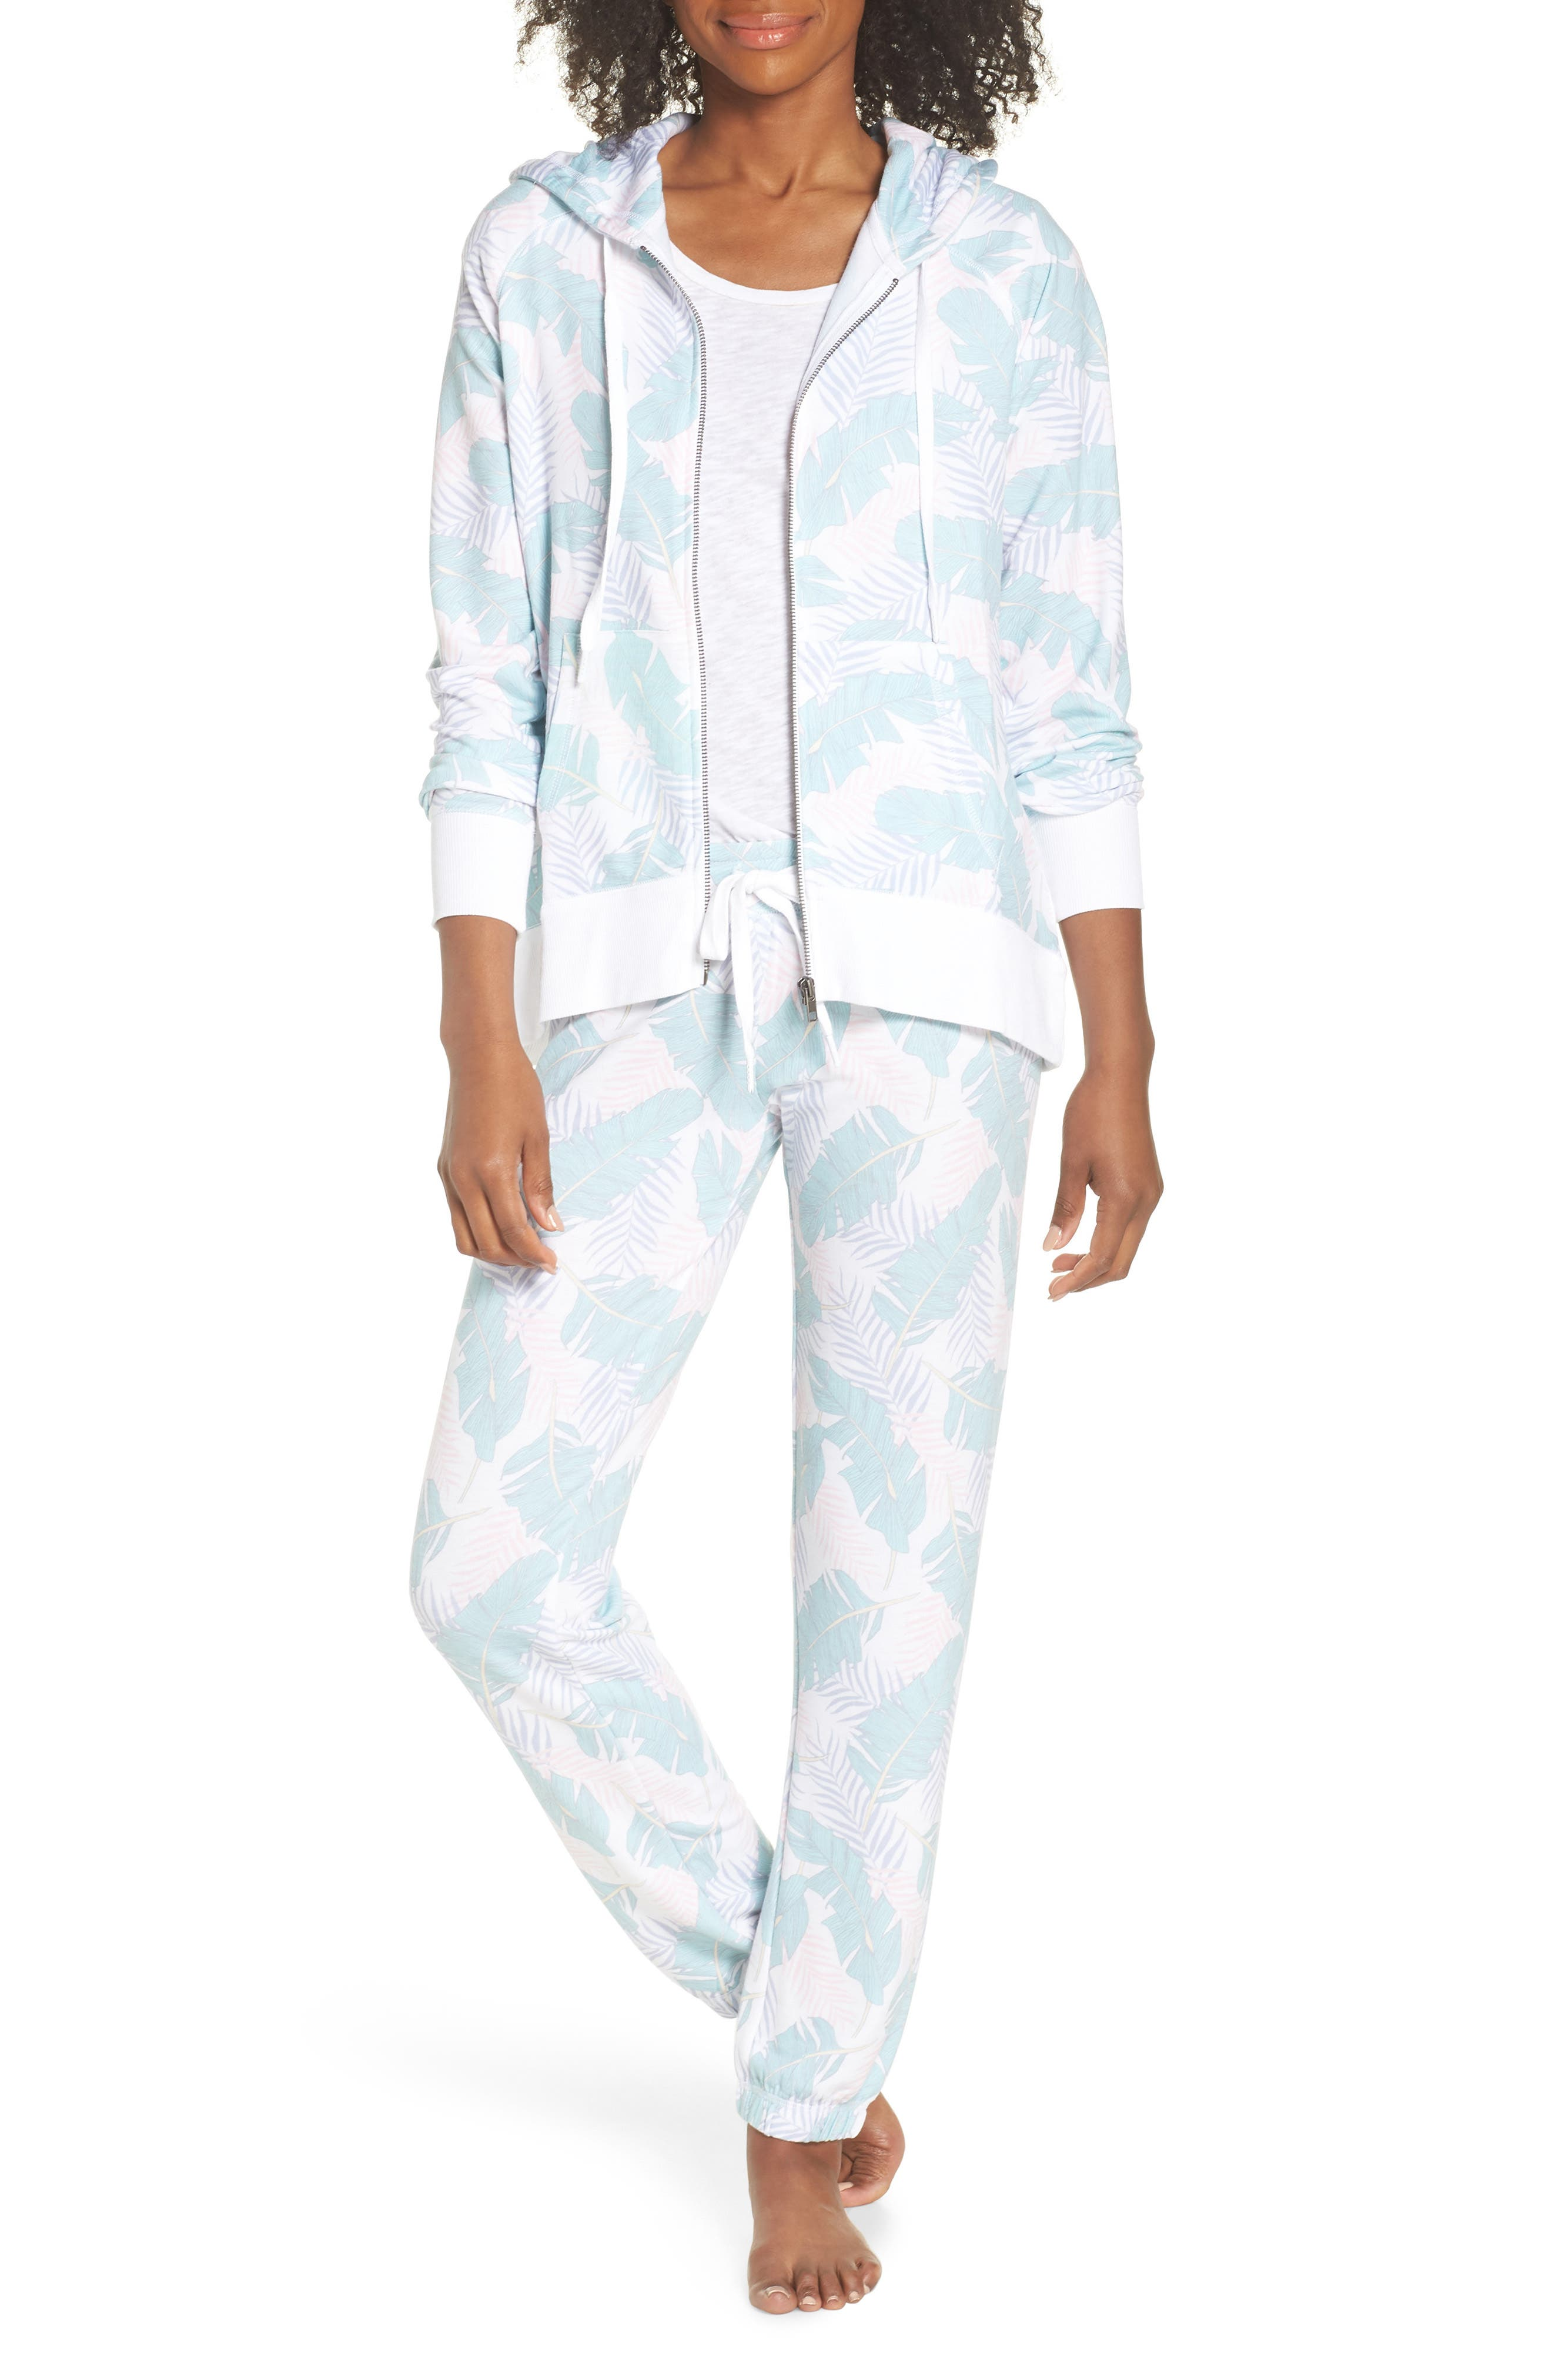 Peachy Jogger Lounge Pants,                             Alternate thumbnail 5, color,                             White